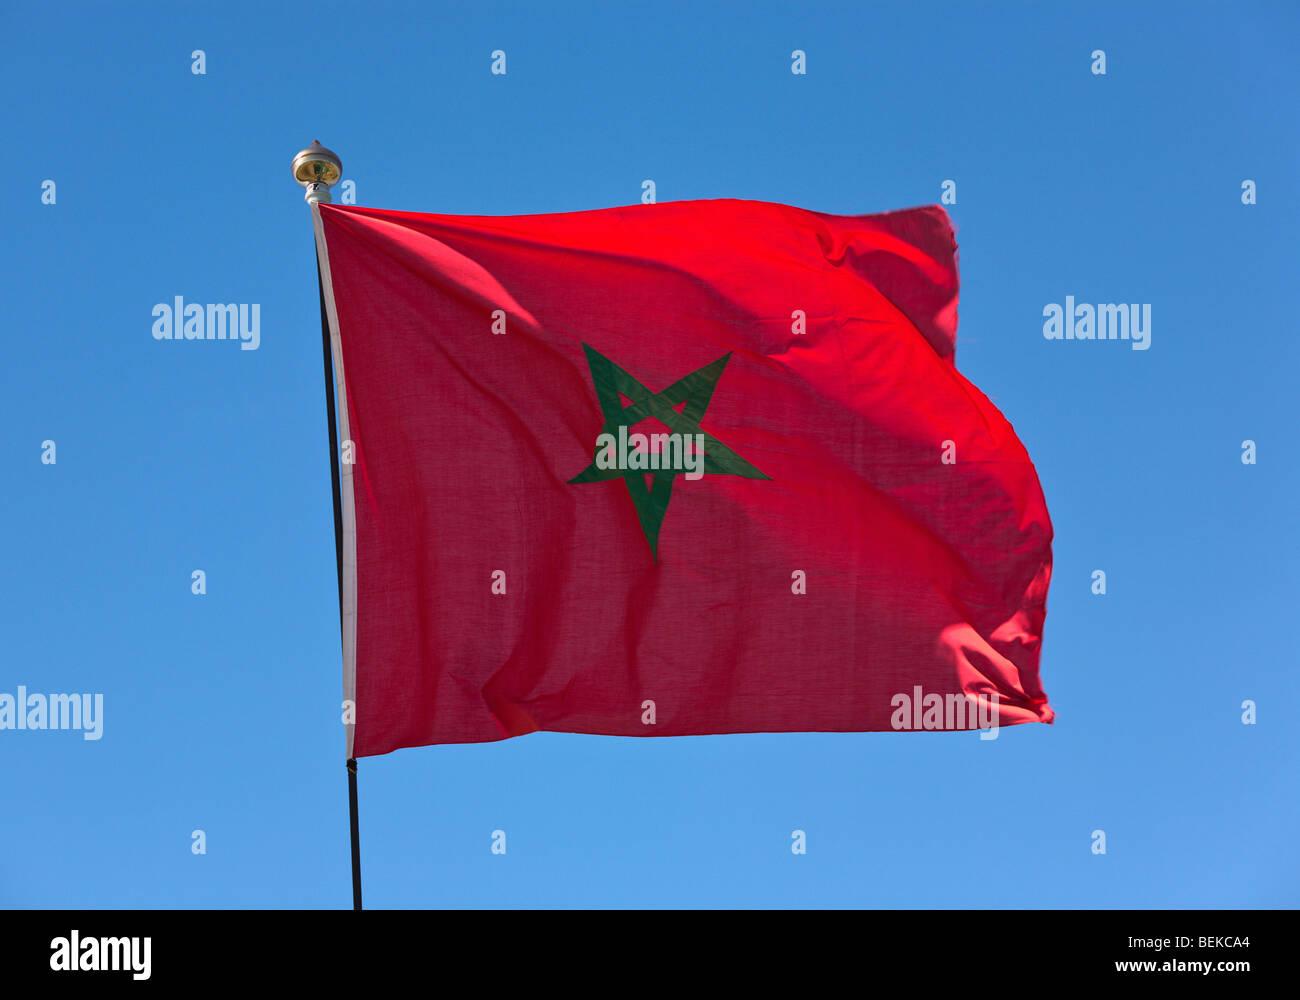 Moroccan flag - Stock Image